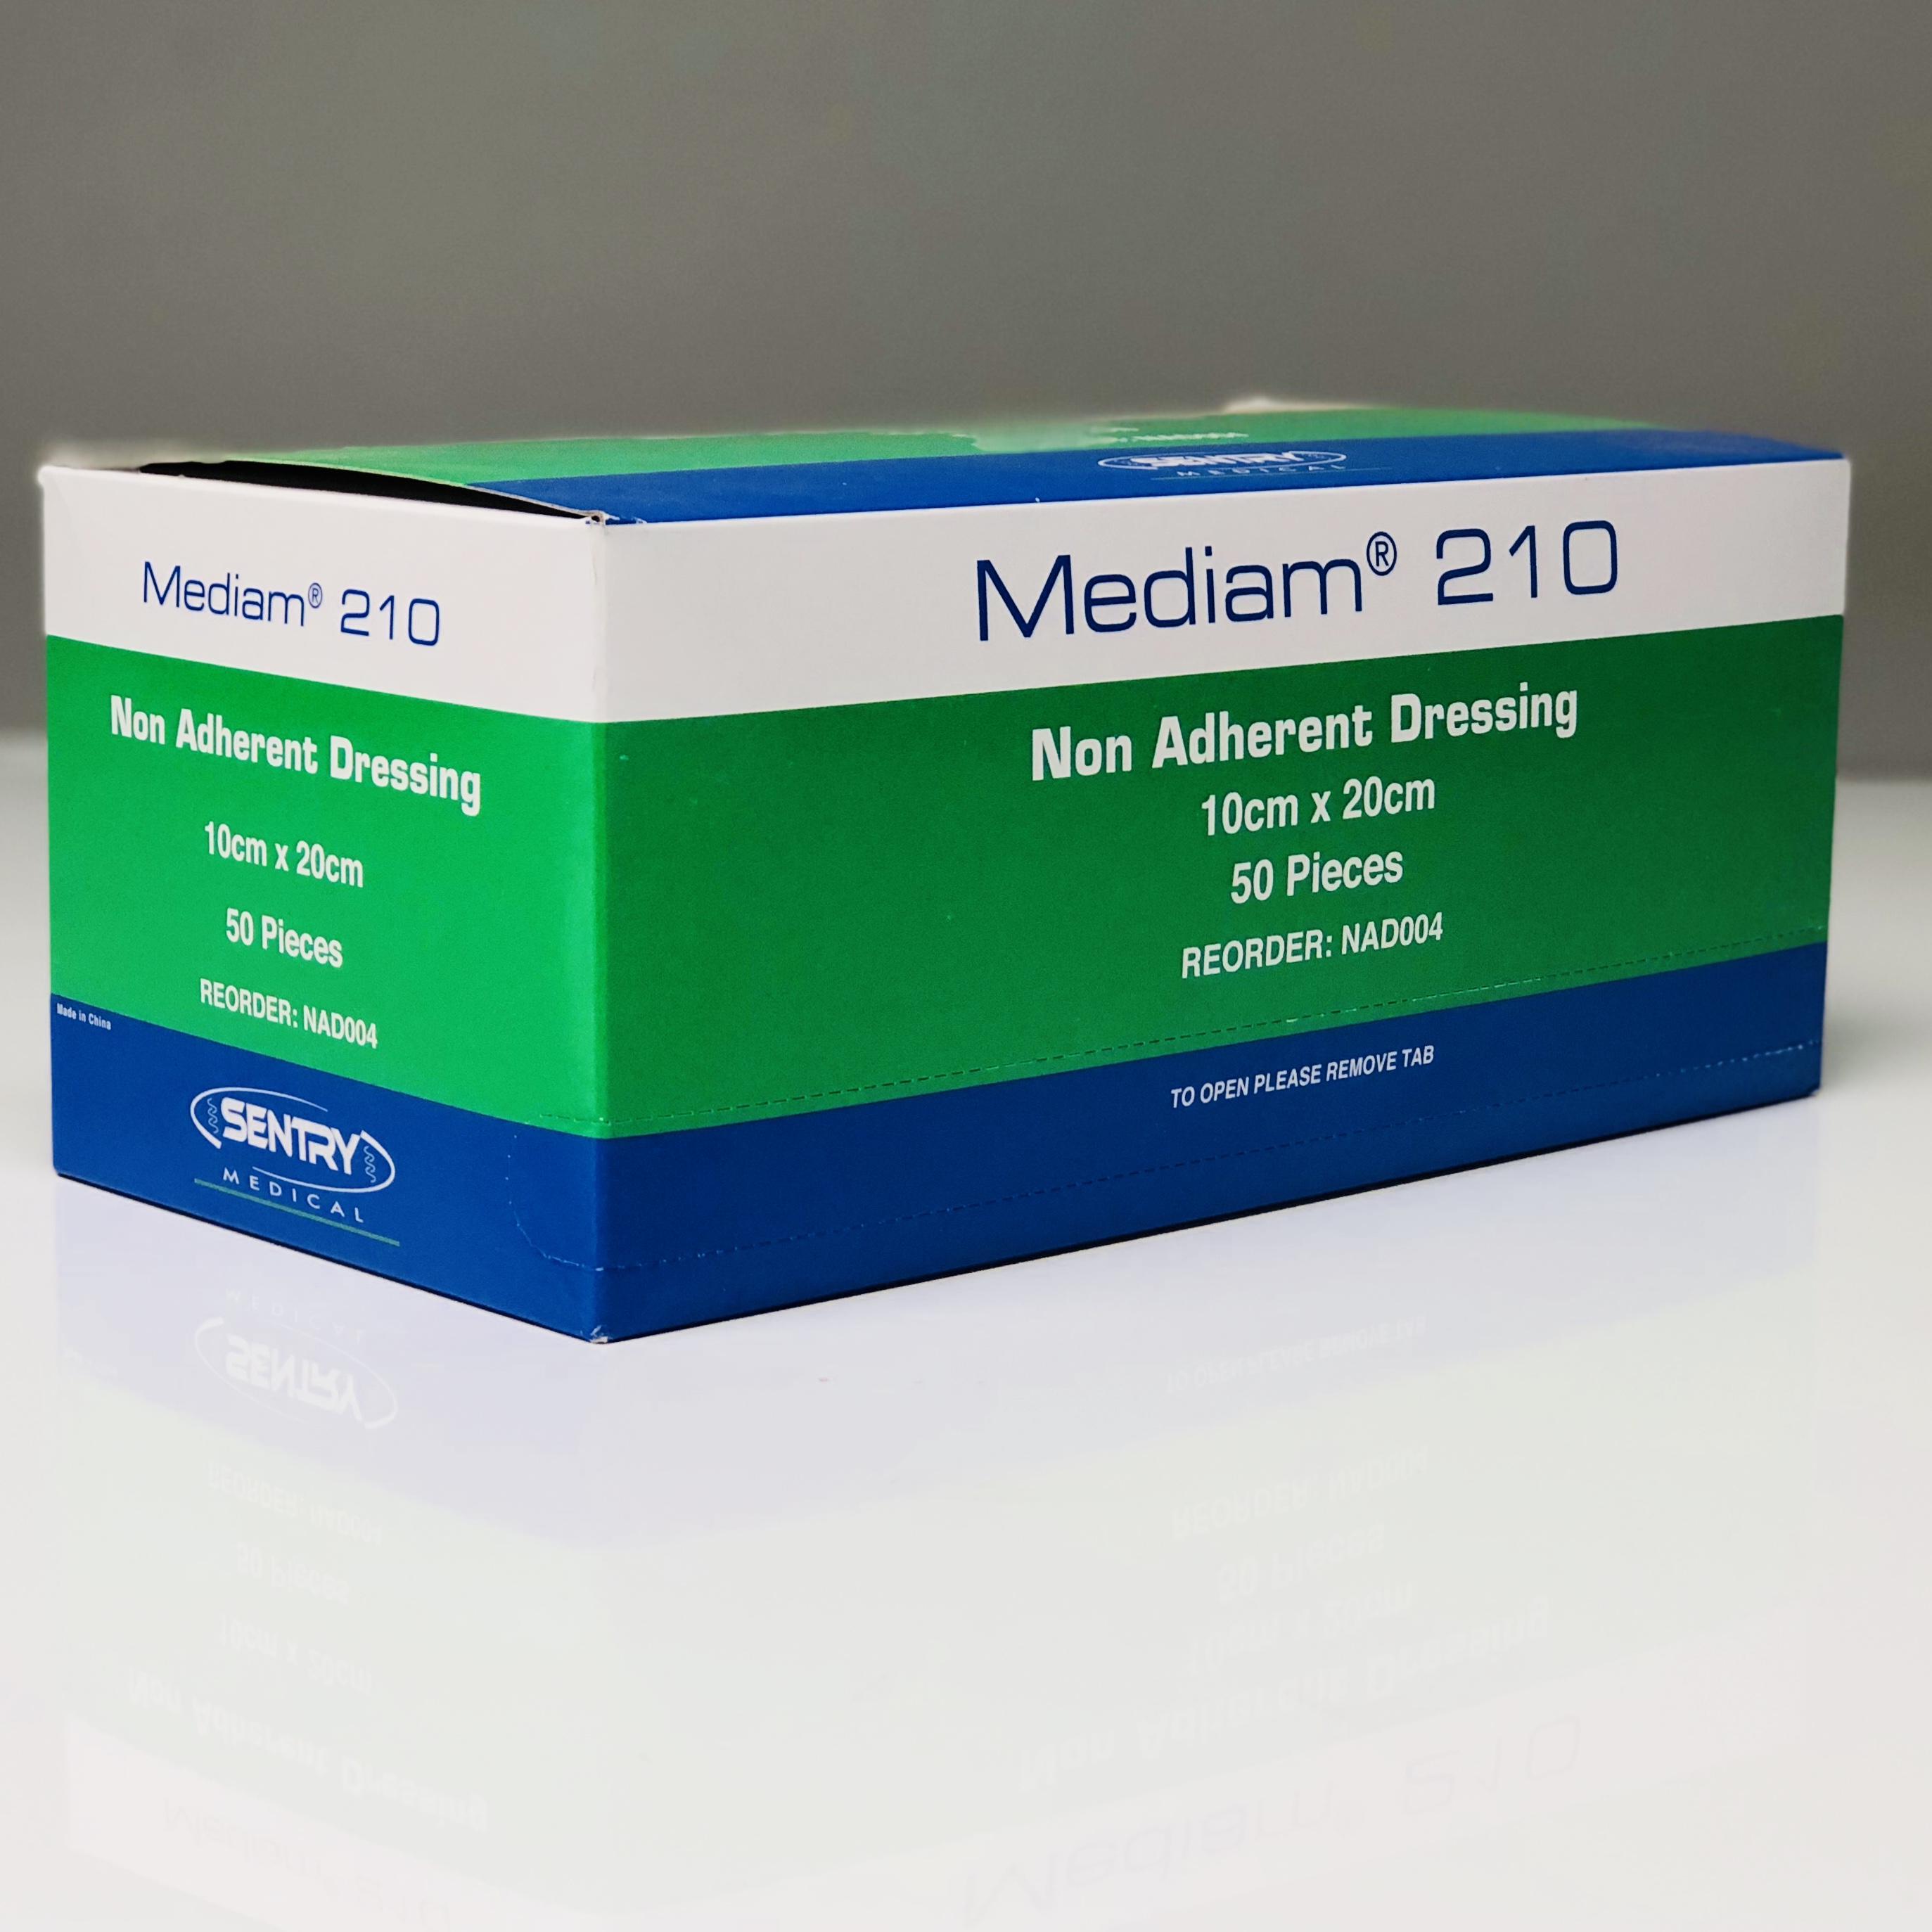 MEDIAM 210 LOW ADHERENT DRESSING 10CMx20CM, BOX 50